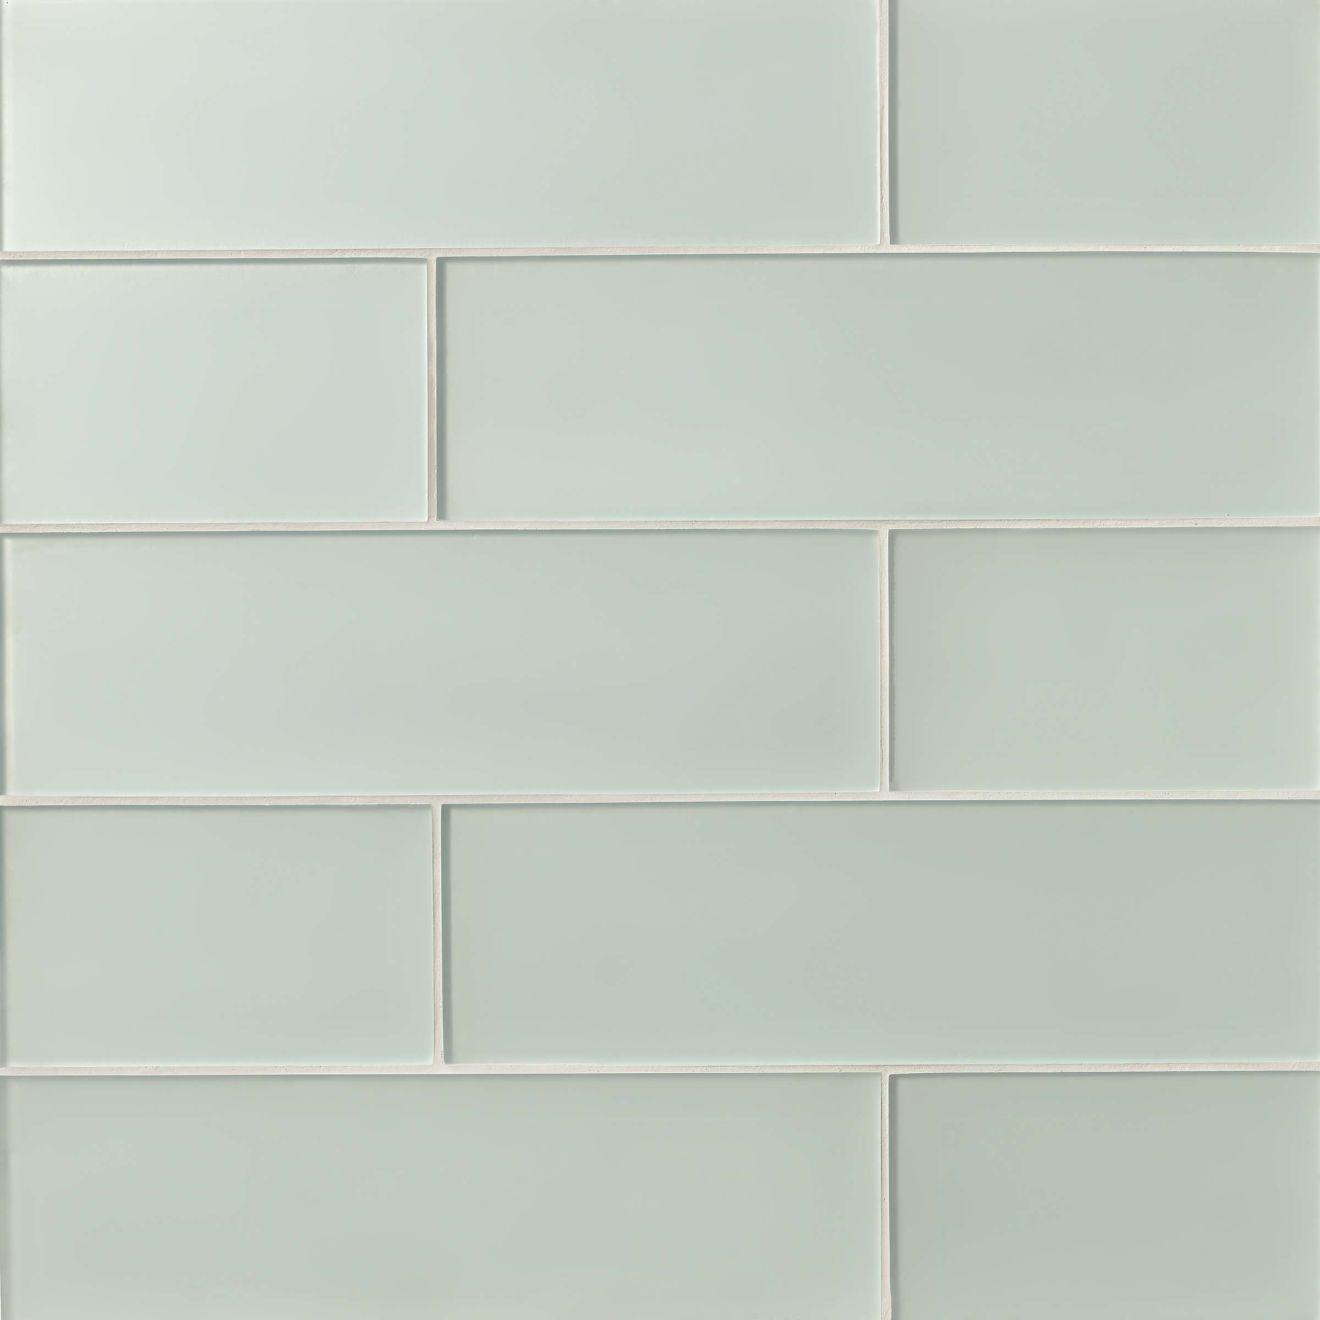 "Verve 6"" x 20"" Wall Tile in Ice Breaker"